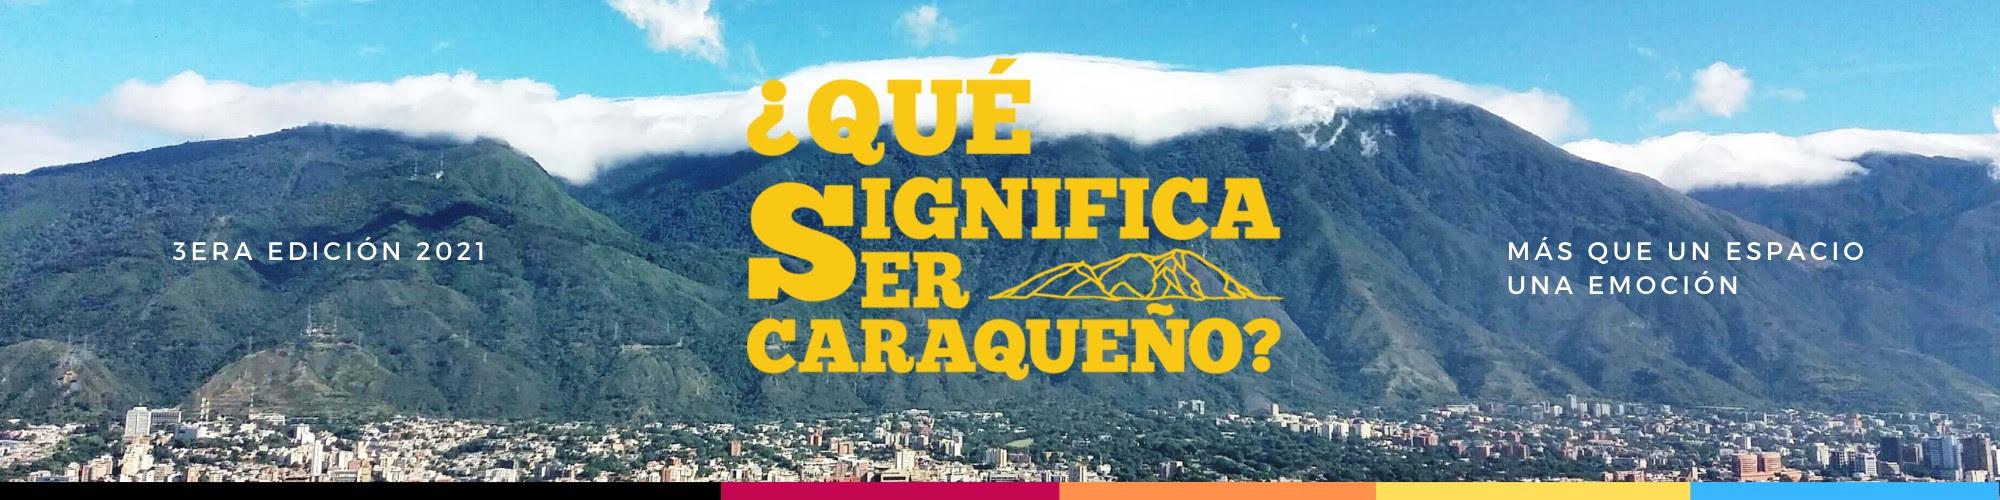 Centro Cultural BOD se suma a esta iniciativa  ¿Qué Significa Ser Caraqueño? inicia su convocatoria 2021